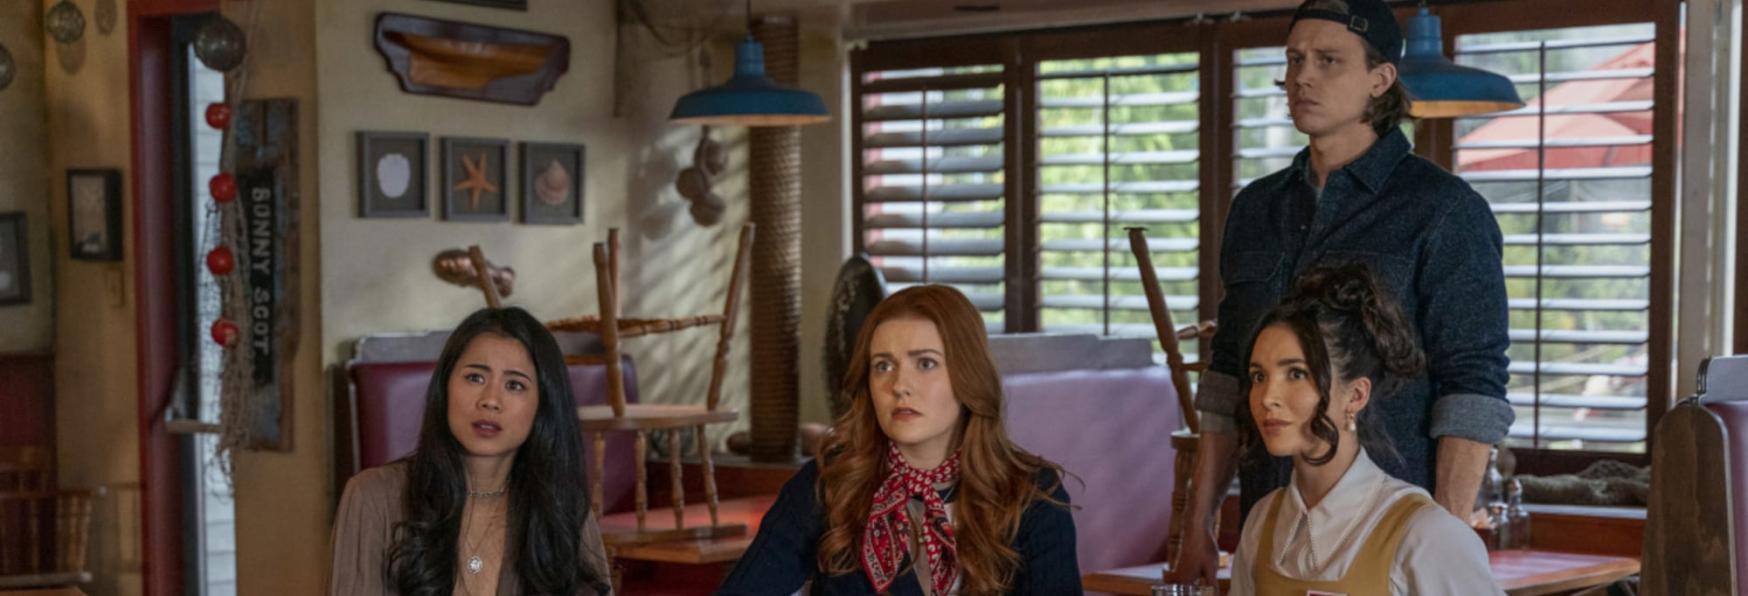 Nancy Drew 3: Trama, Cast, Data di Uscita, Trailer e Anticipazioni